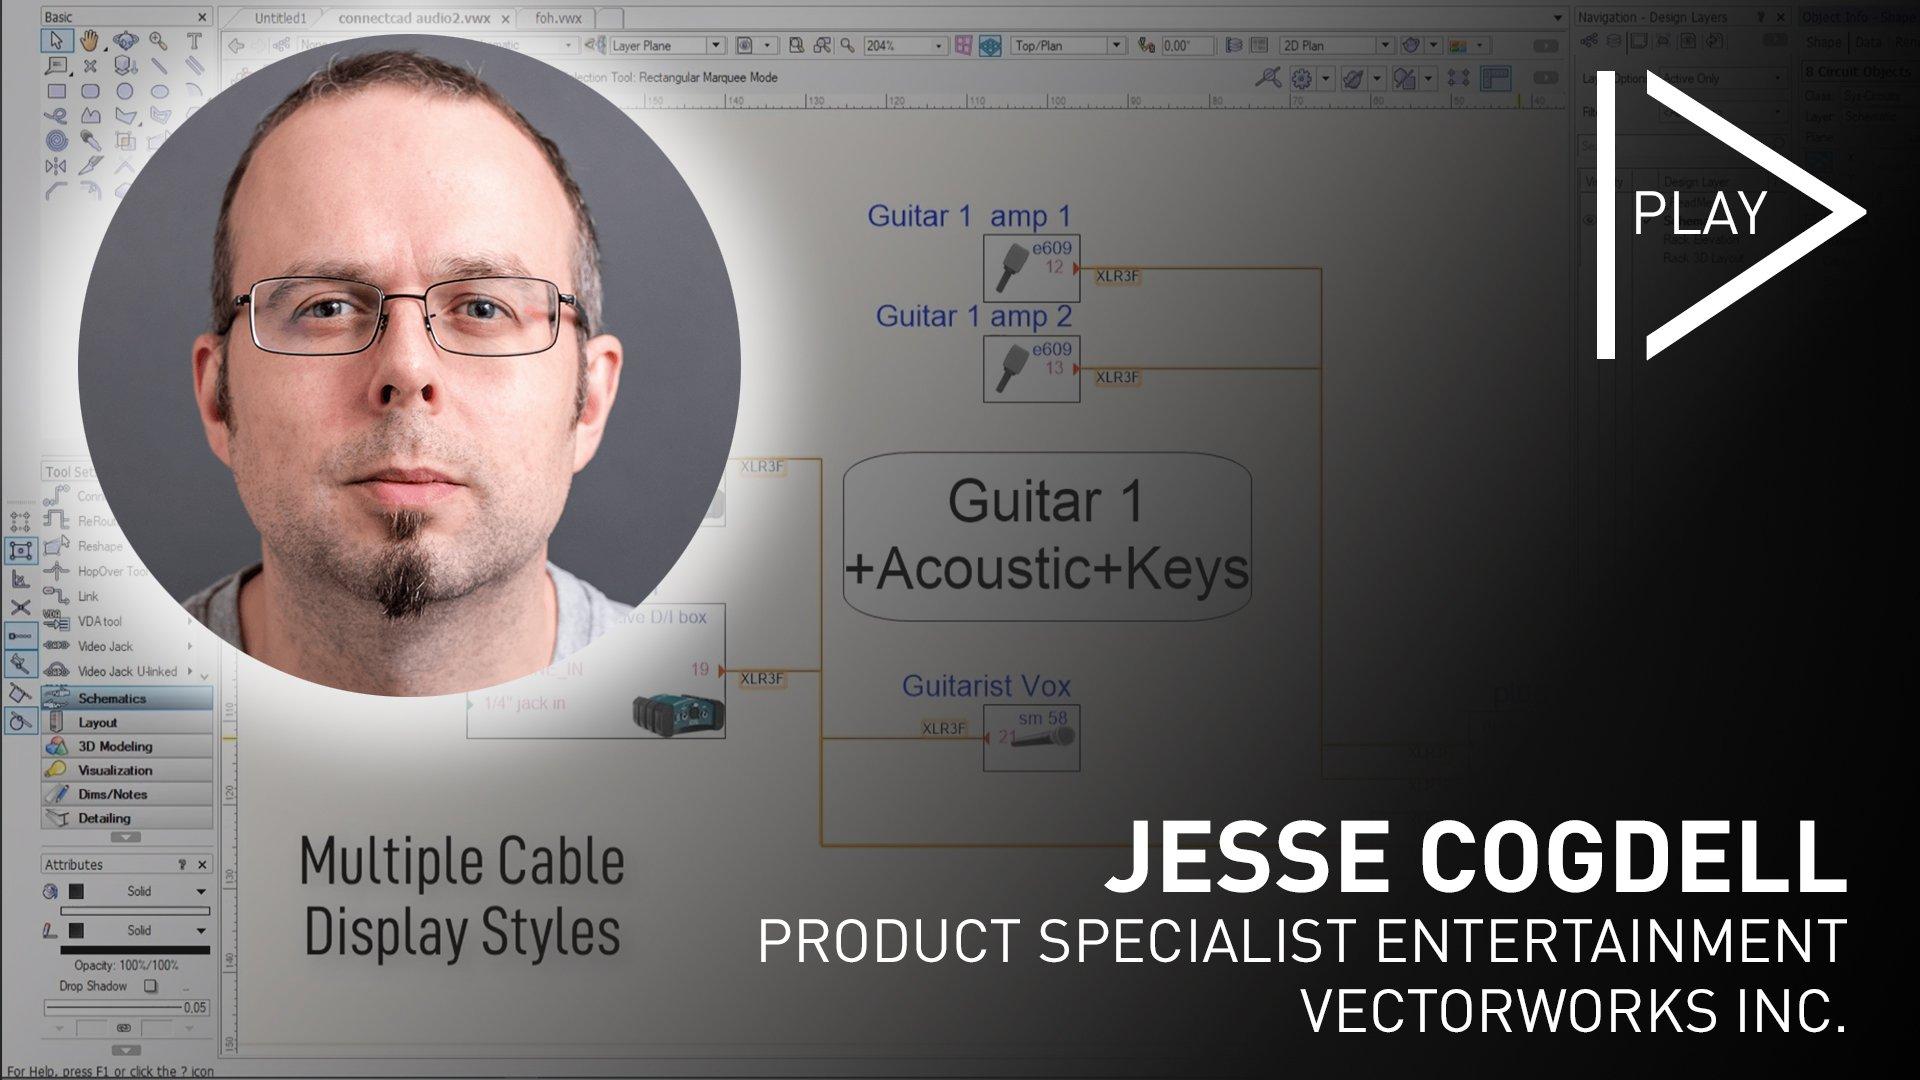 Jesse_Cogdell-Vectorworks_INC-Prolight + Sound-CAD-Vectorworks-Spotlight-2020